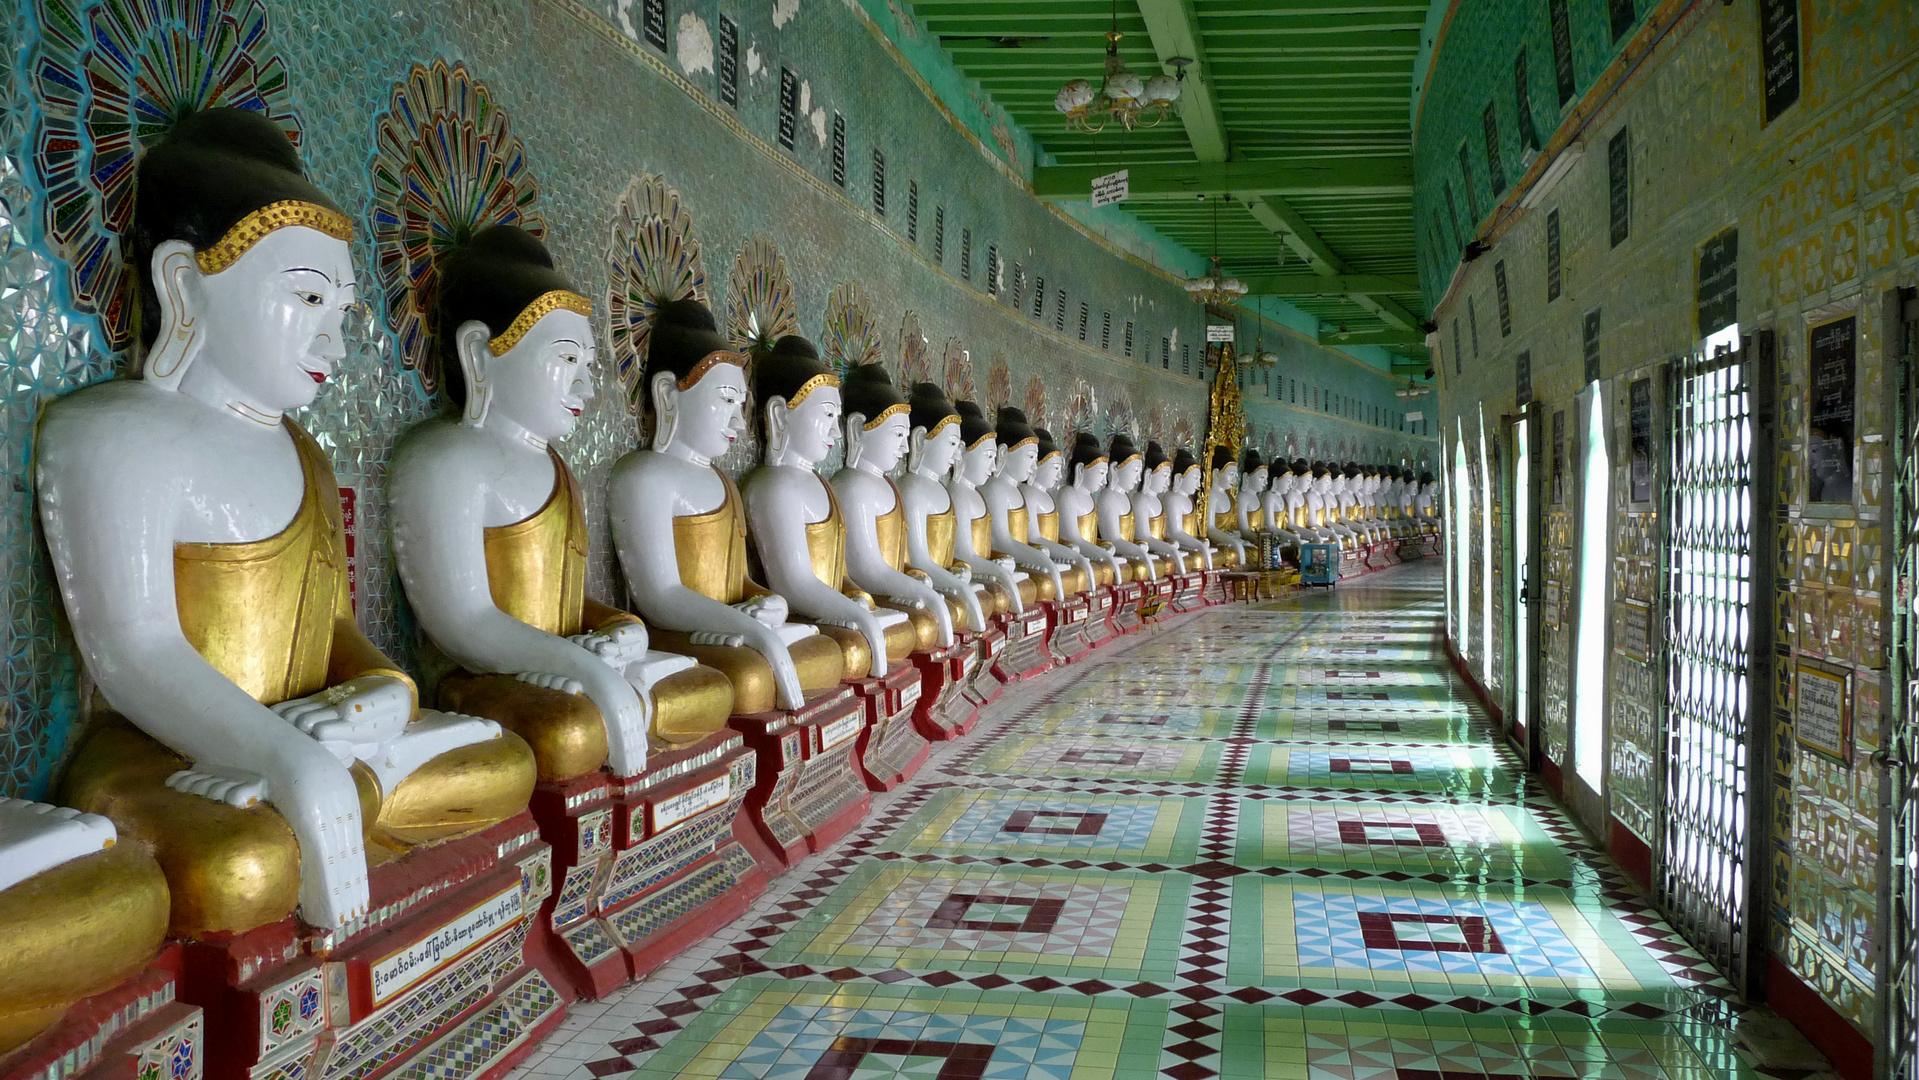 Buddhas in Perspektive